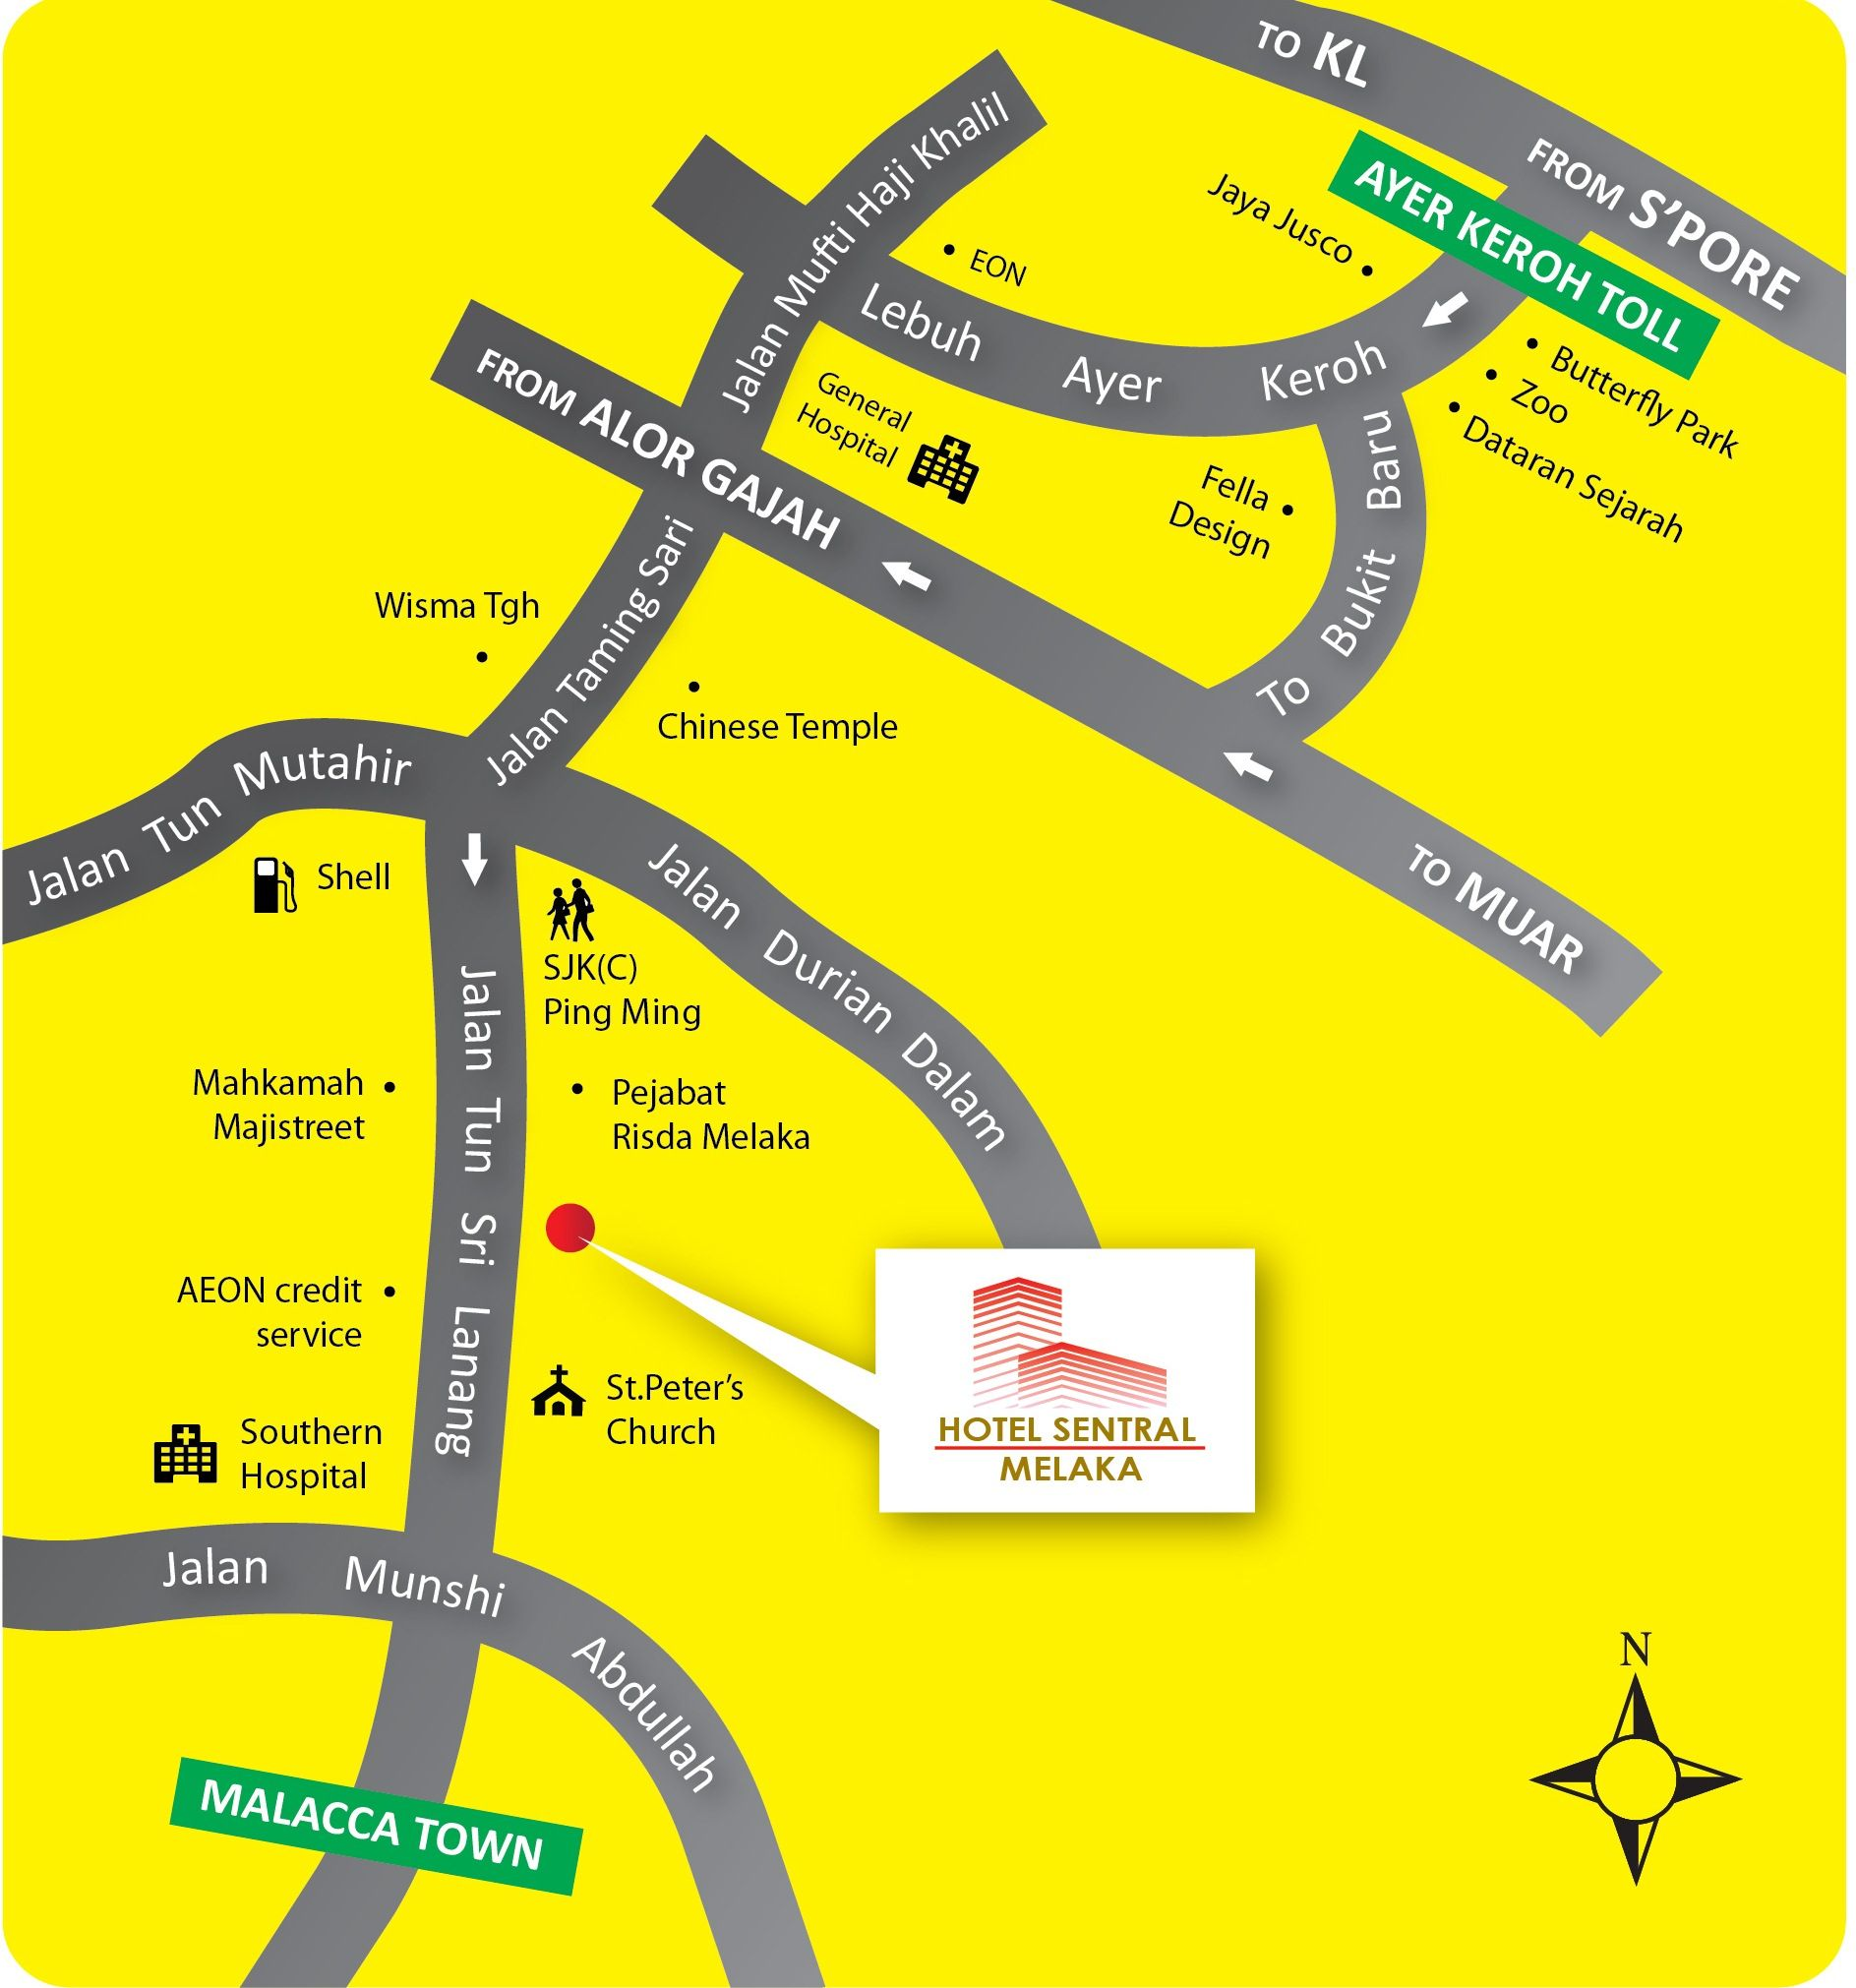 Hotel Sentral Melaka  Location Map  Follow us httpswww